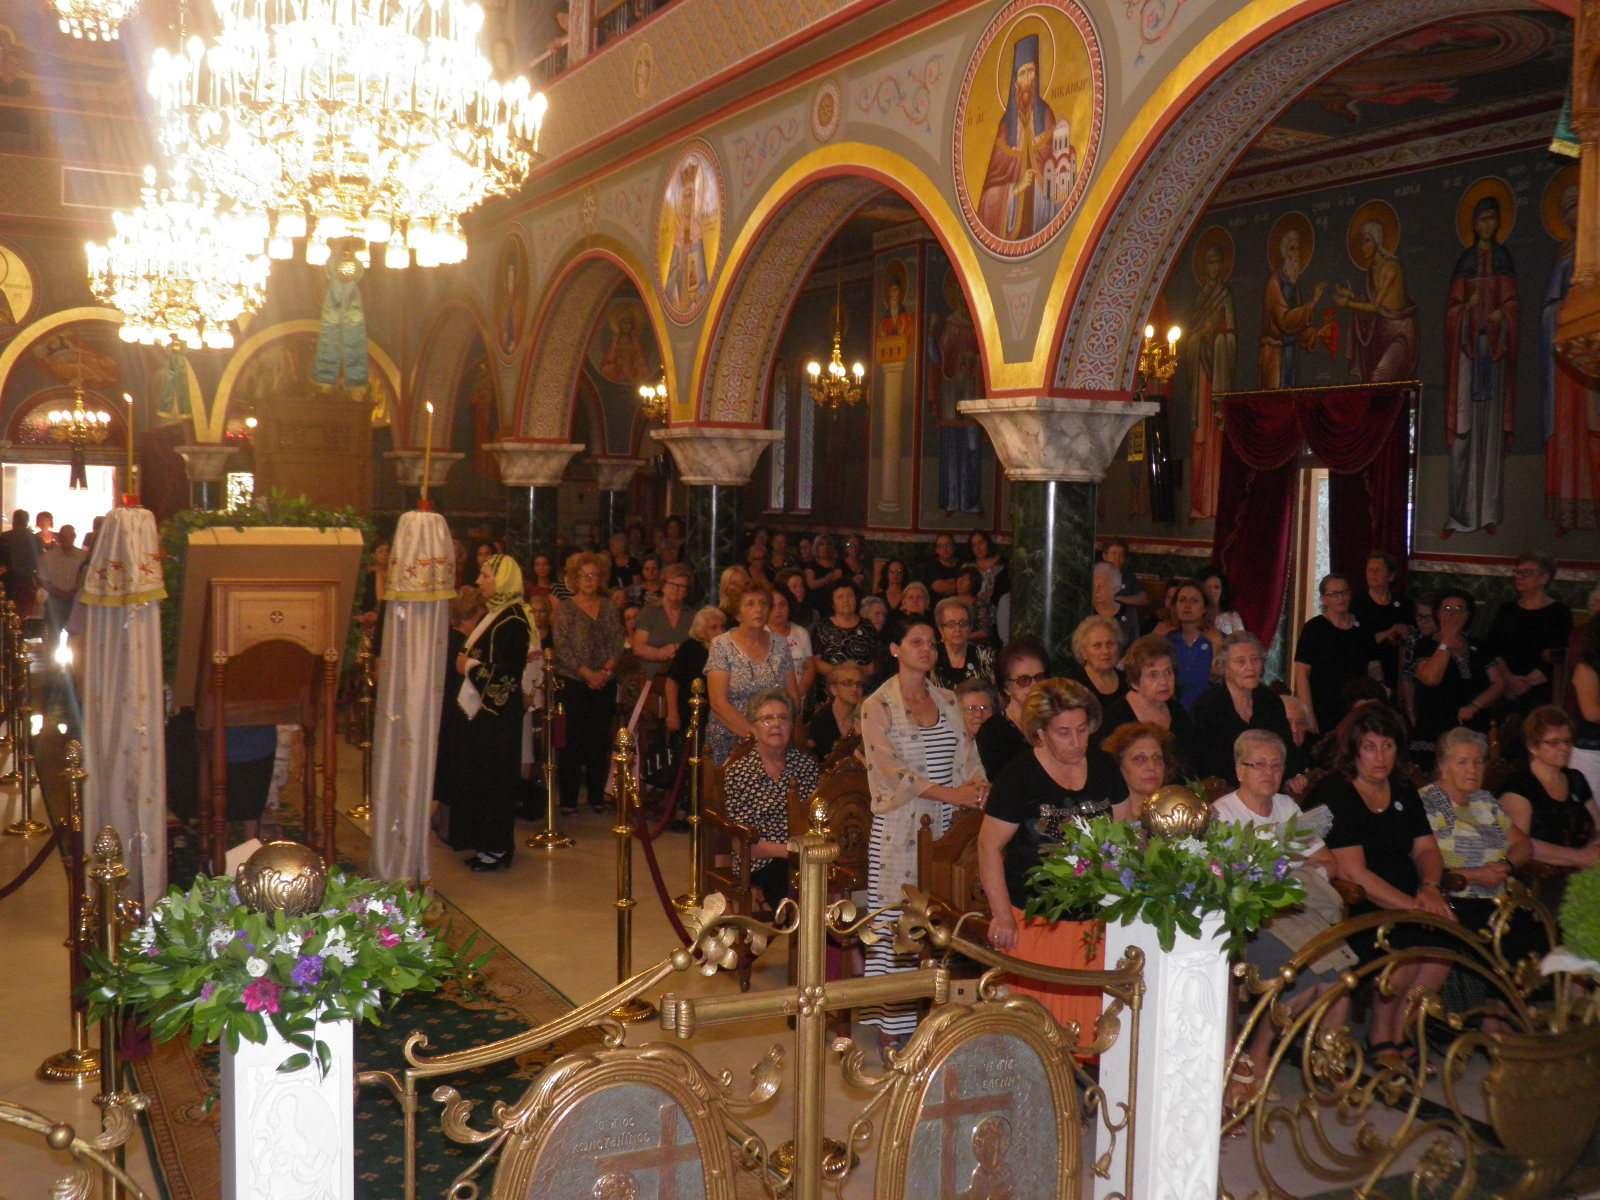 Kozan.gr: Μέγας Πανηγυρικός Αρχιερατικός Εσπερινός, με αφορμή τον εορτασμό της Υψώσεως του Τιμίου Σταυρού,  πραγματοποιήθηκε στον Ιερό Ναό των Αγίων Κωνσταντίνου και Ελένης Κοζάνης, το απόγευμα της Παρασκευής 13/9 (Φωτογραφίες & Βίντεο)